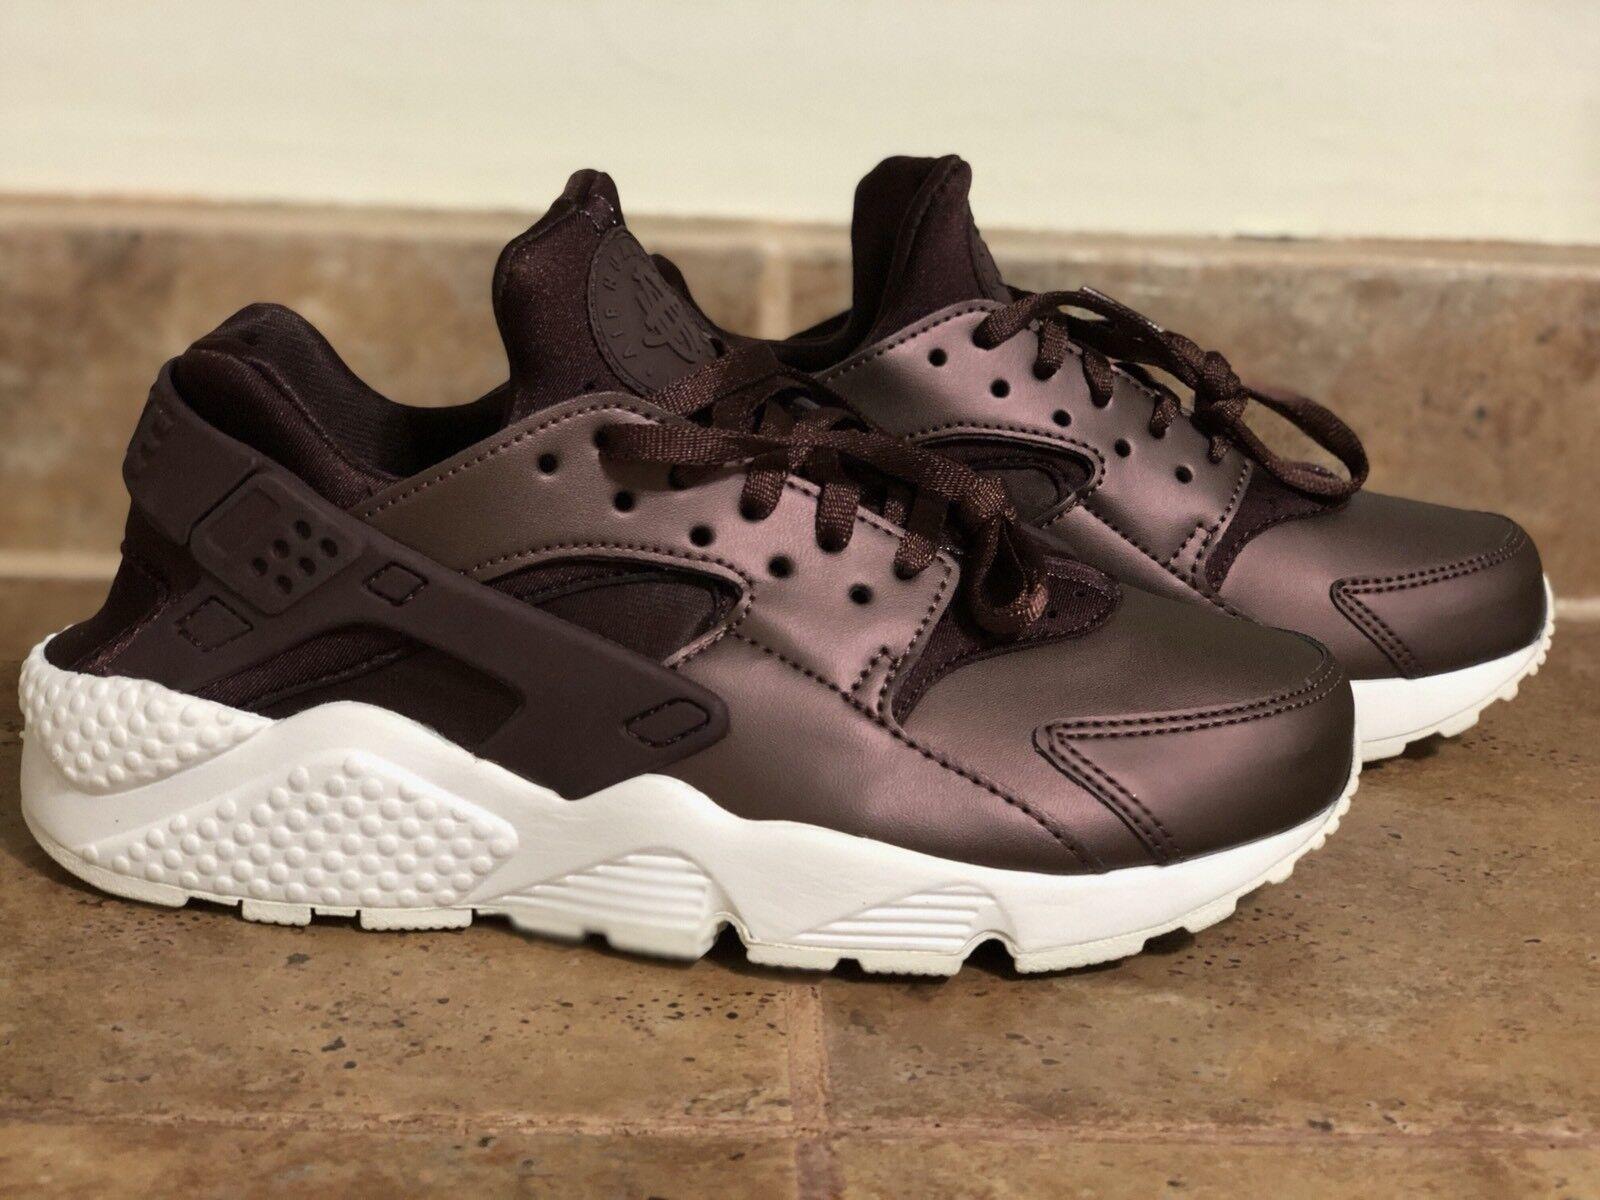 Nike WMNS Air Huarache Premium TXT SZ 6.5 AA0523-202 Metallic Mahogany Women New